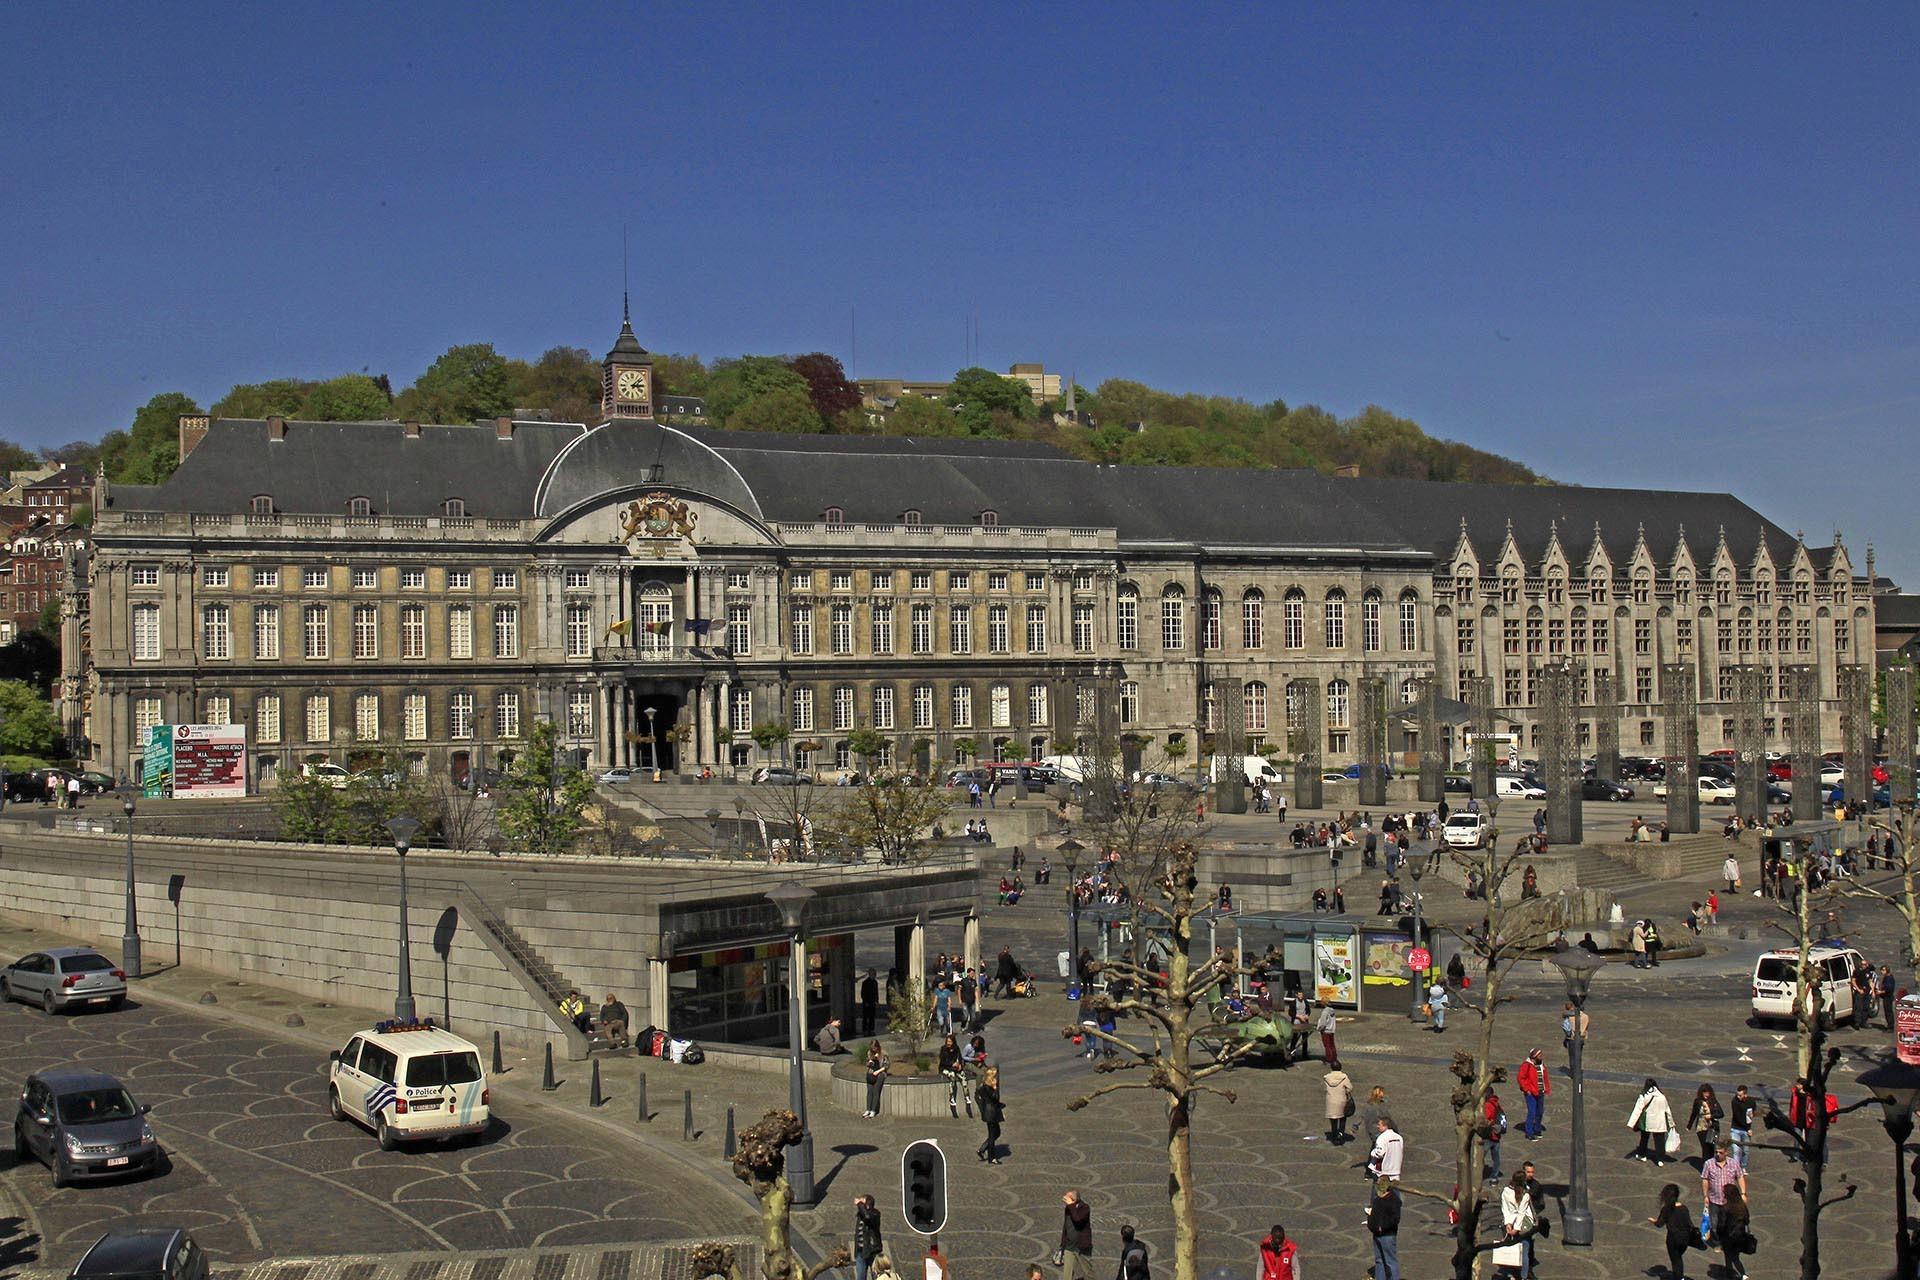 Prince-Bishops' Palace in Liège